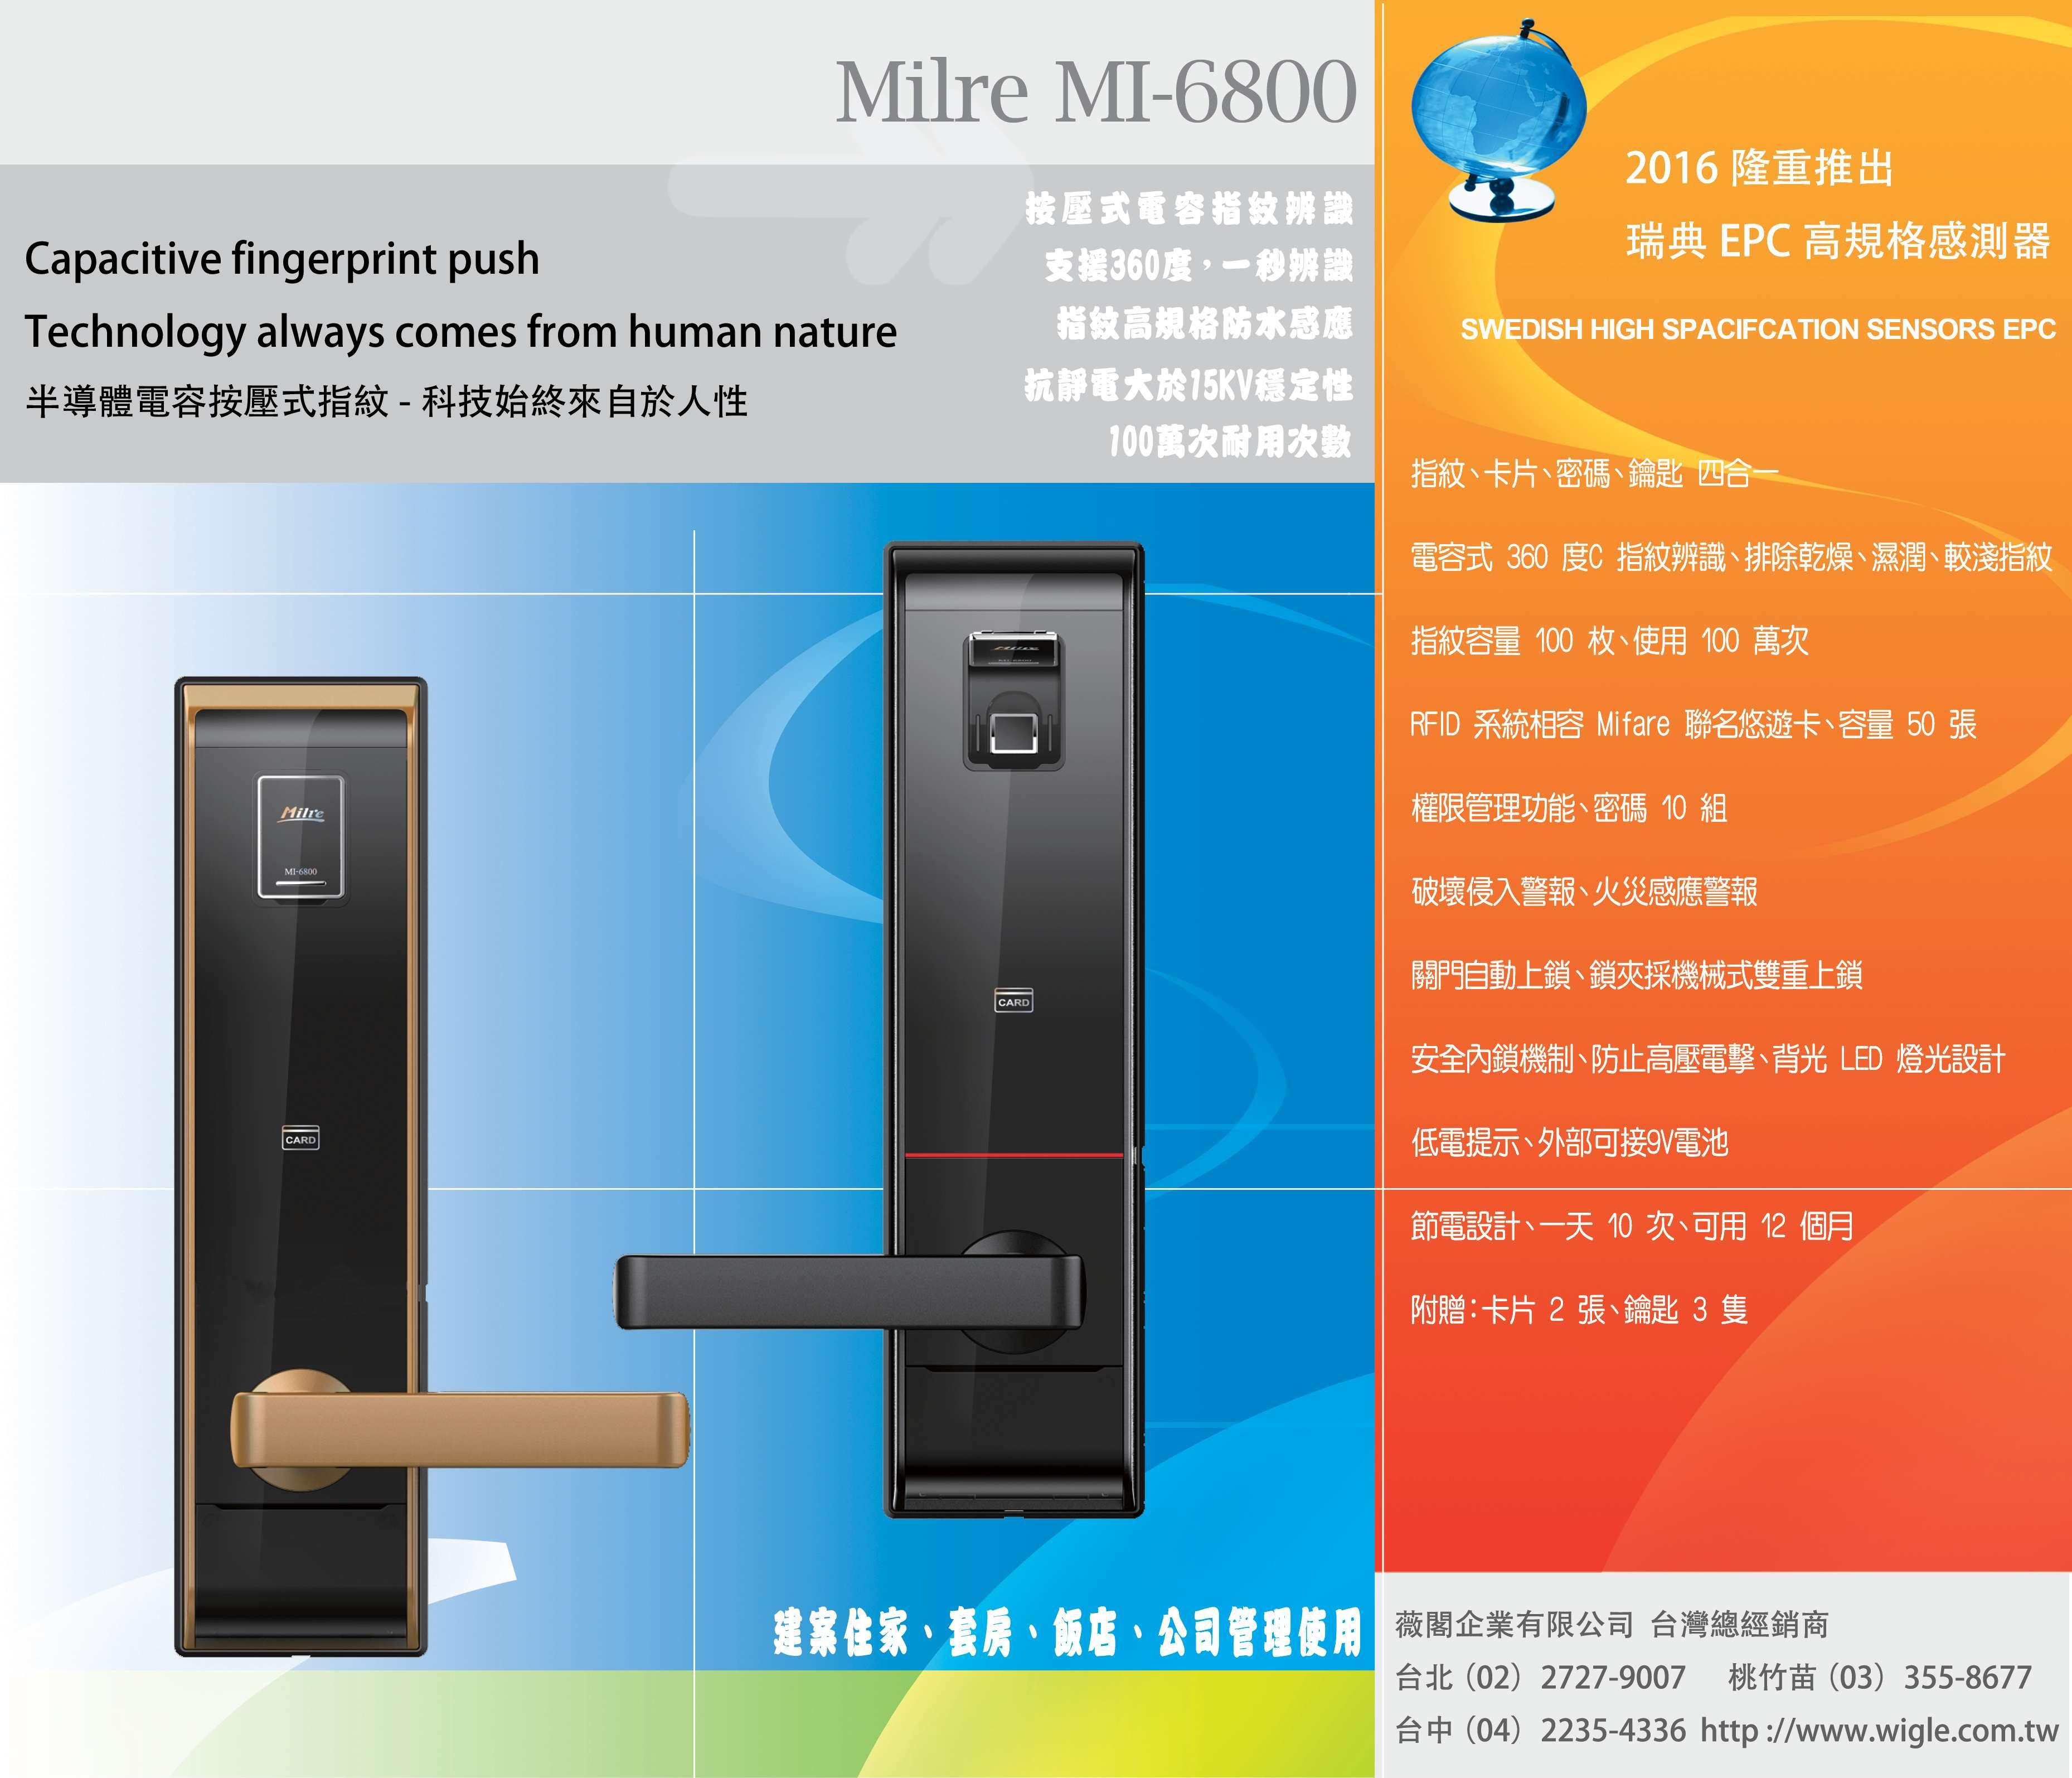 Milre MI-6800指紋+卡片+密碼+鑰匙 全省安裝服務  0800-279-007